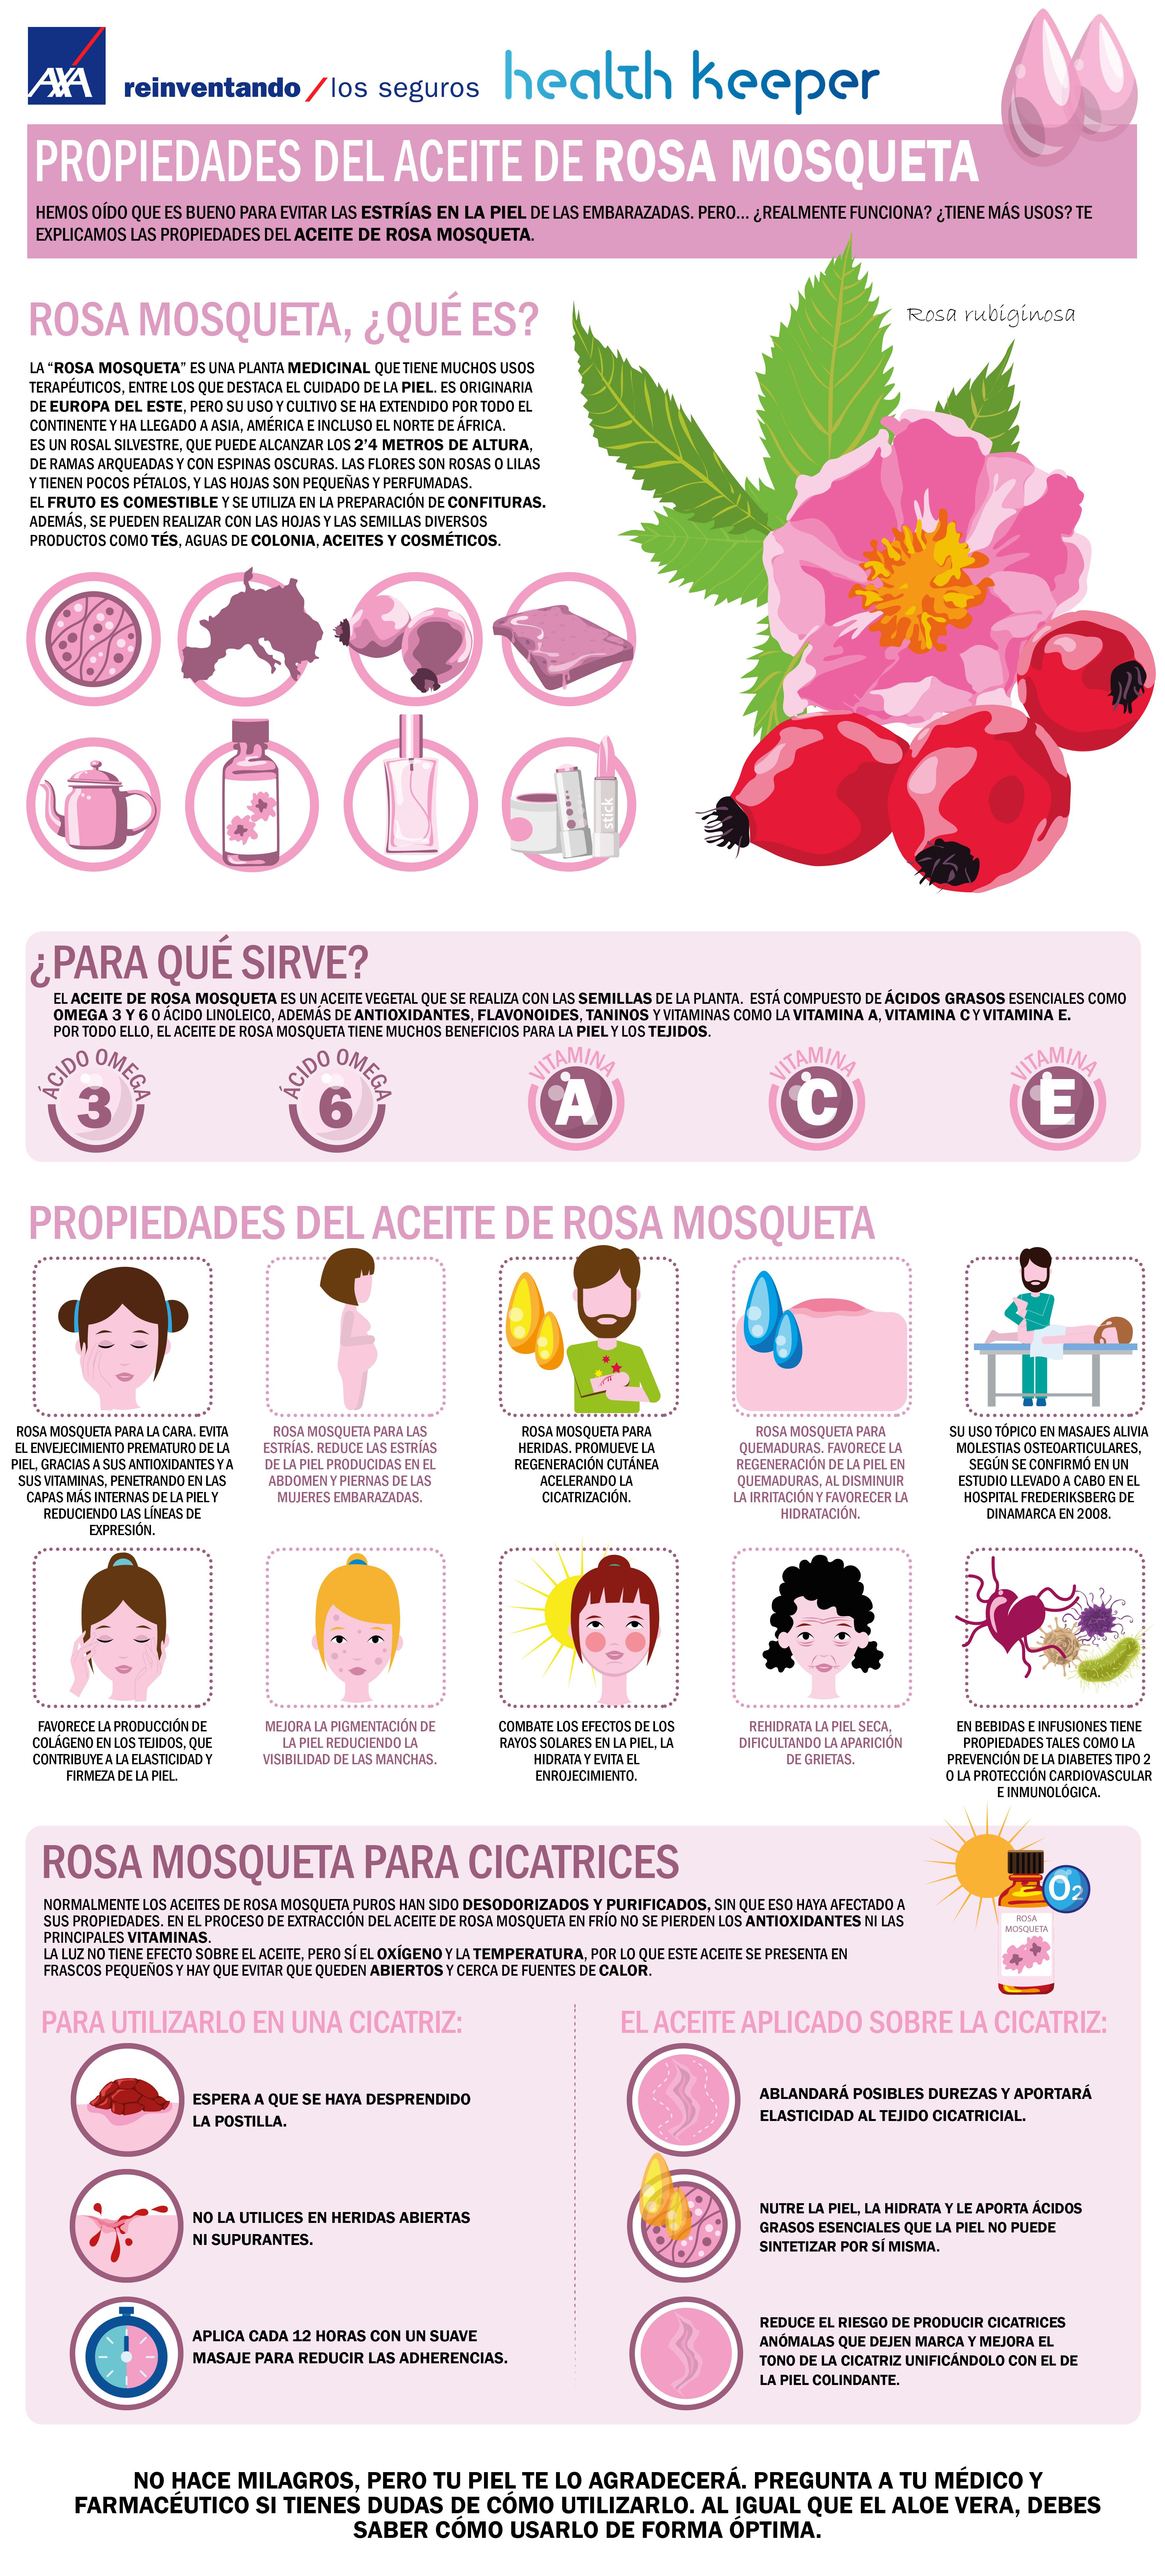 Propiedades Del Aceite De Rosa Mosqueta Axa Healthkeeper